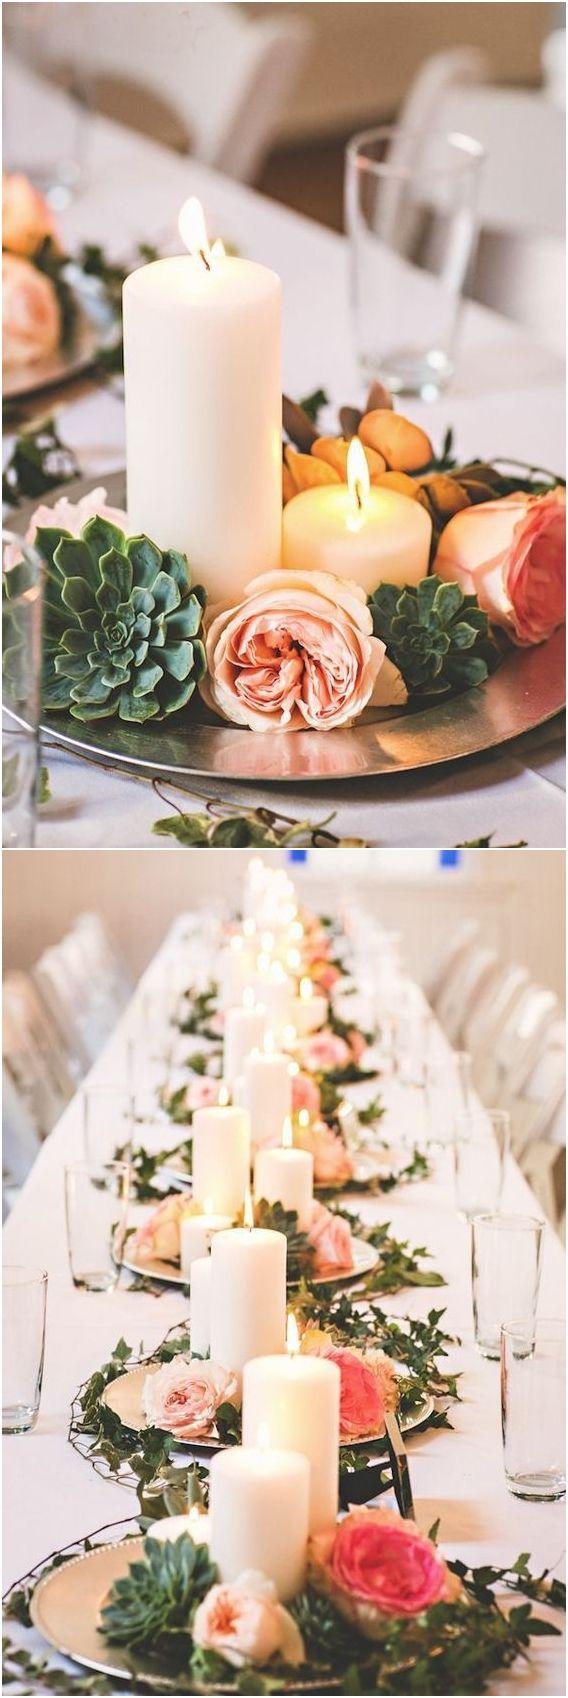 elegant succulent wedding centerpiece ideas wedding decors